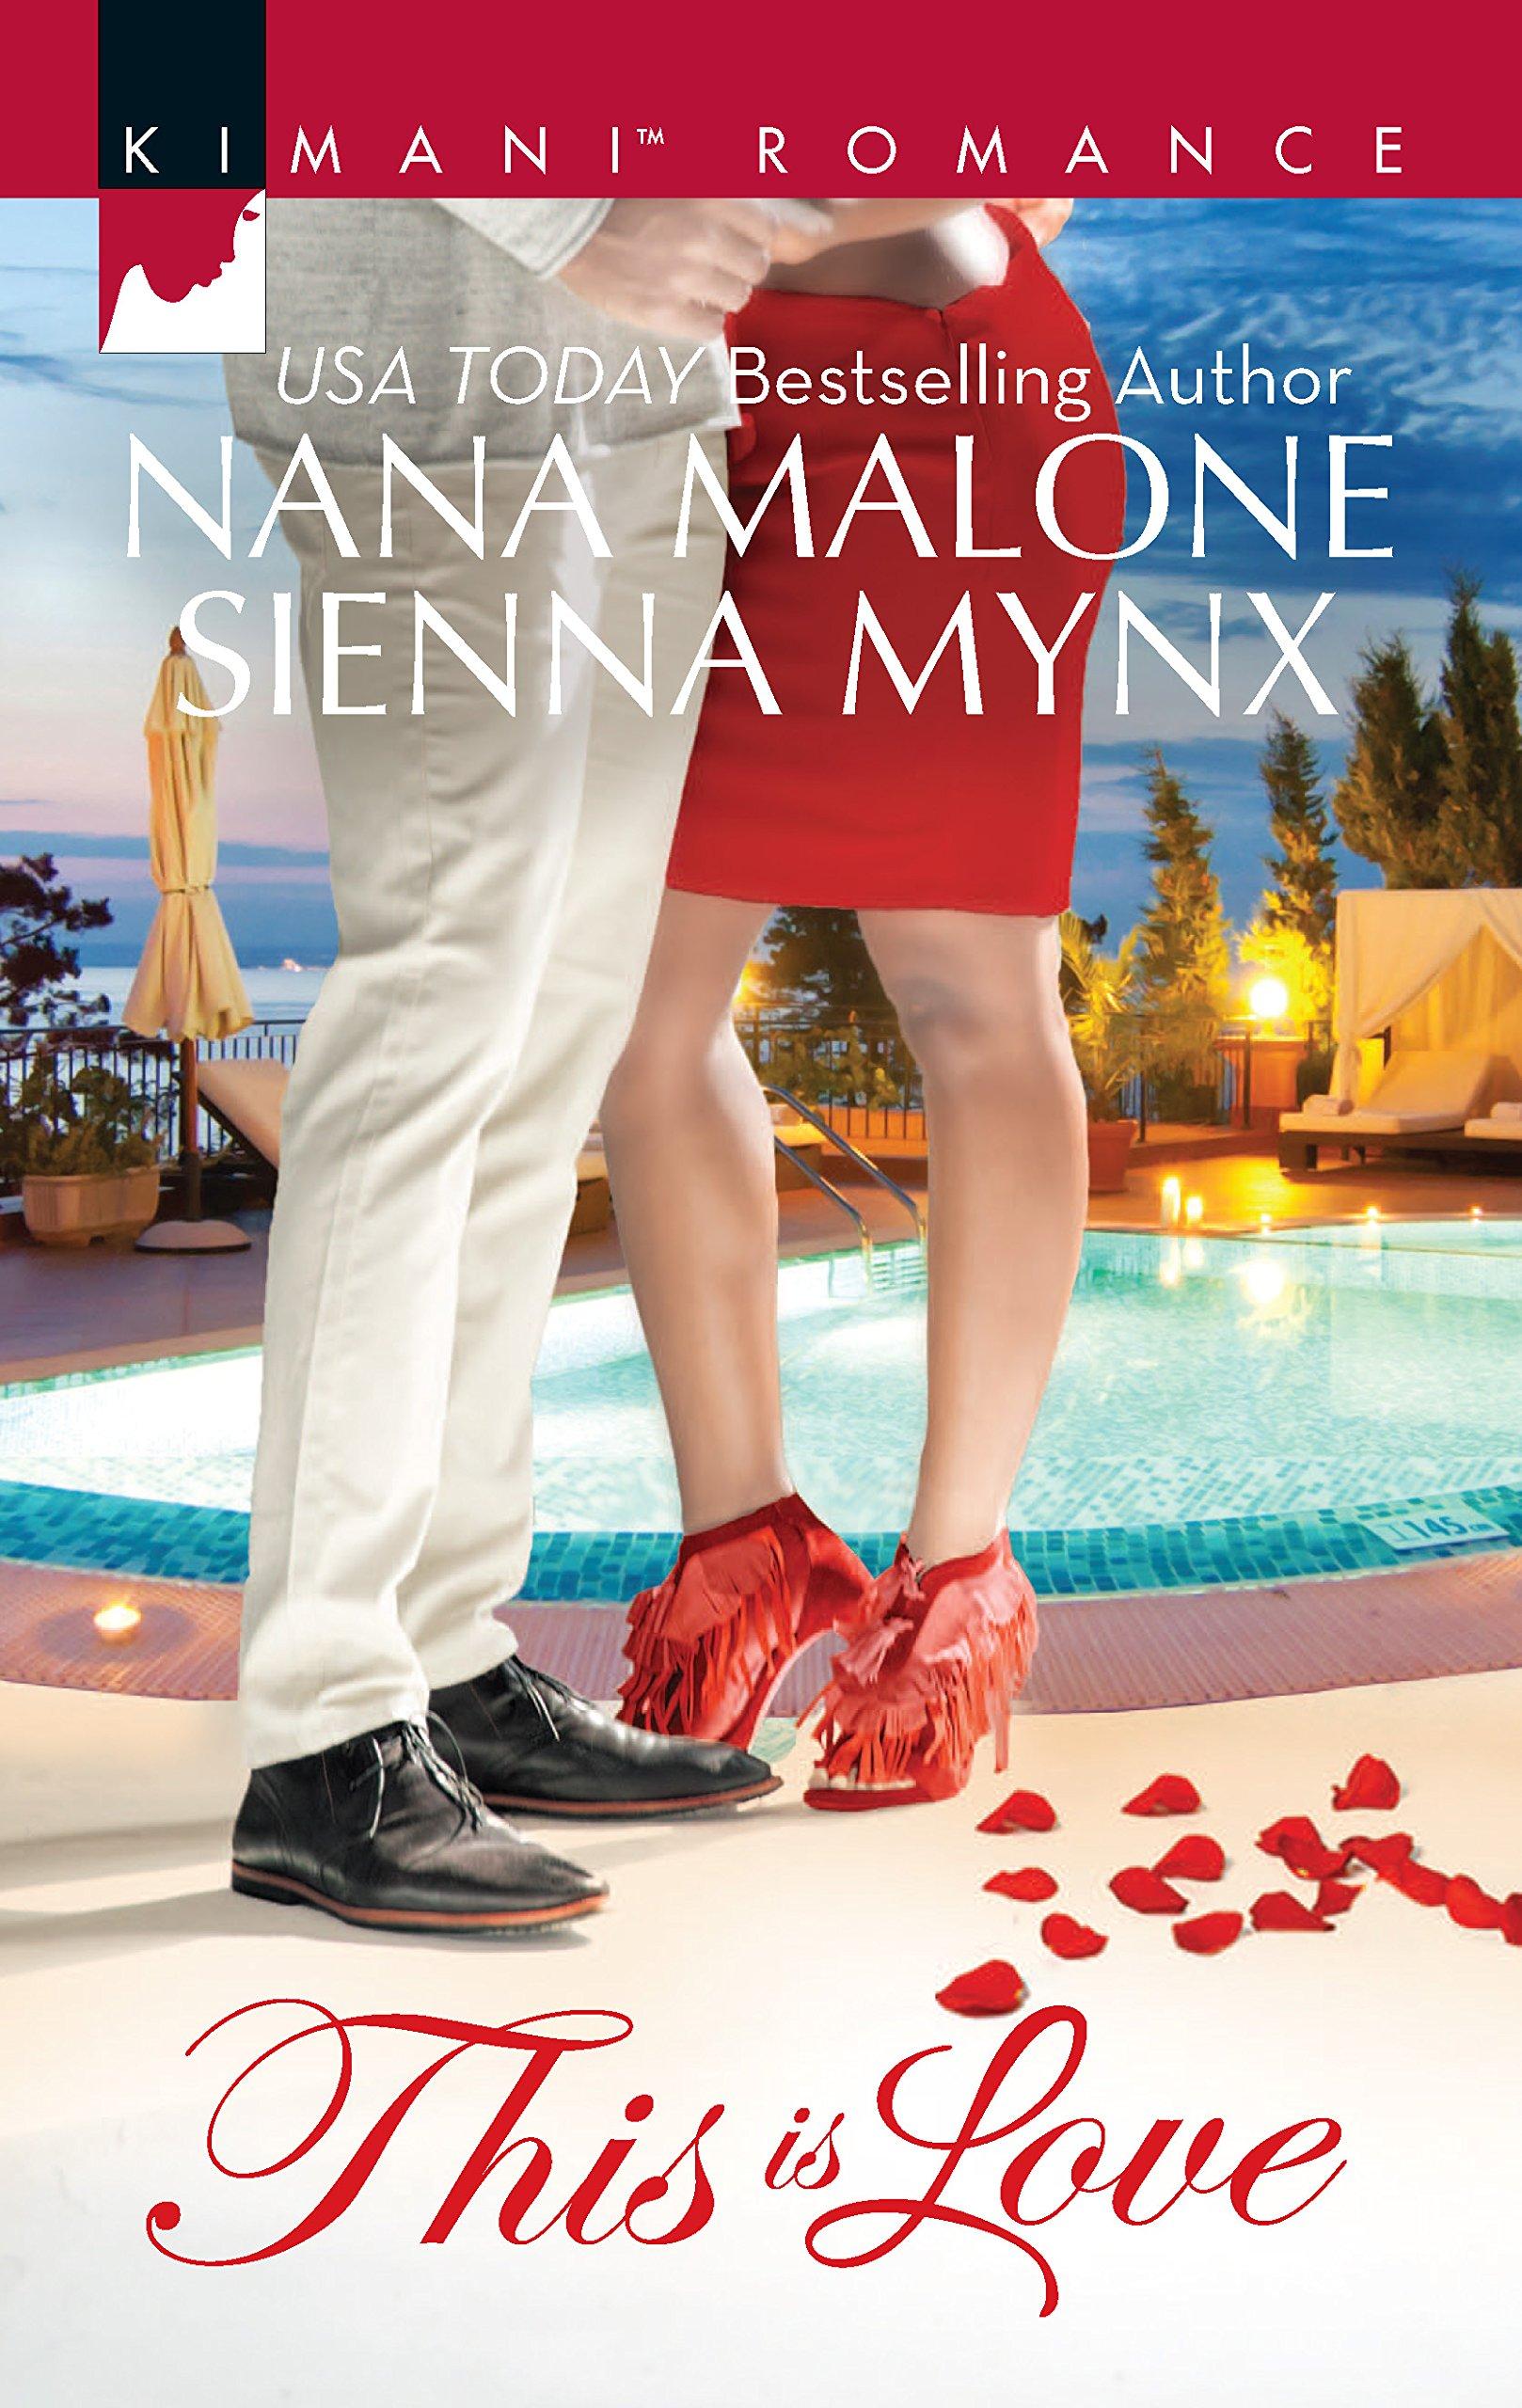 Amazon.com: This Is Love: An Anthology (Kimani Romance) (9780373864850):  Nana Malone, Sienna Mynx: Books